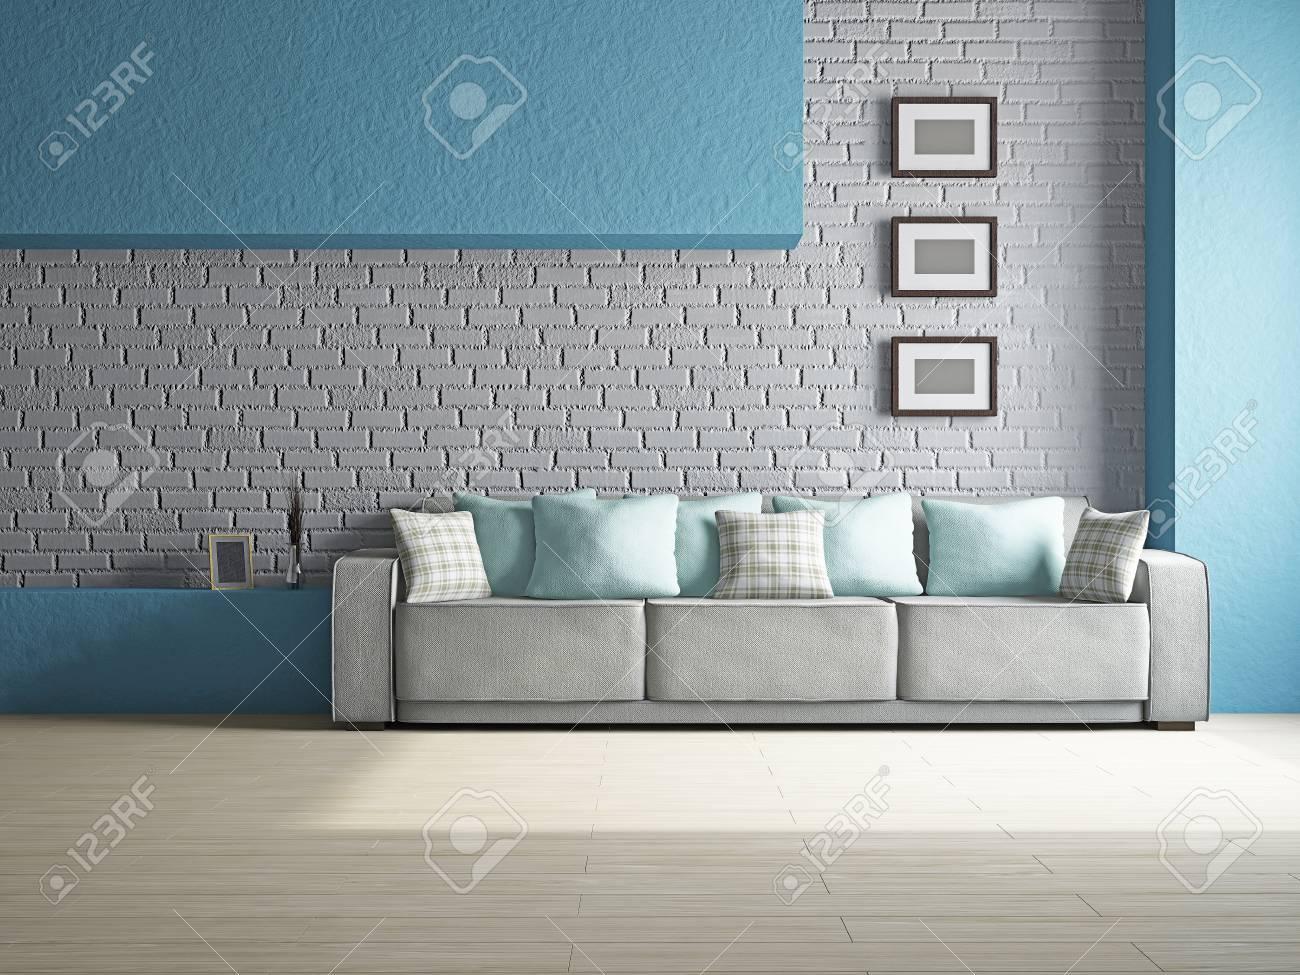 Livingroom with sofa near the wall Stock Photo - 19322784